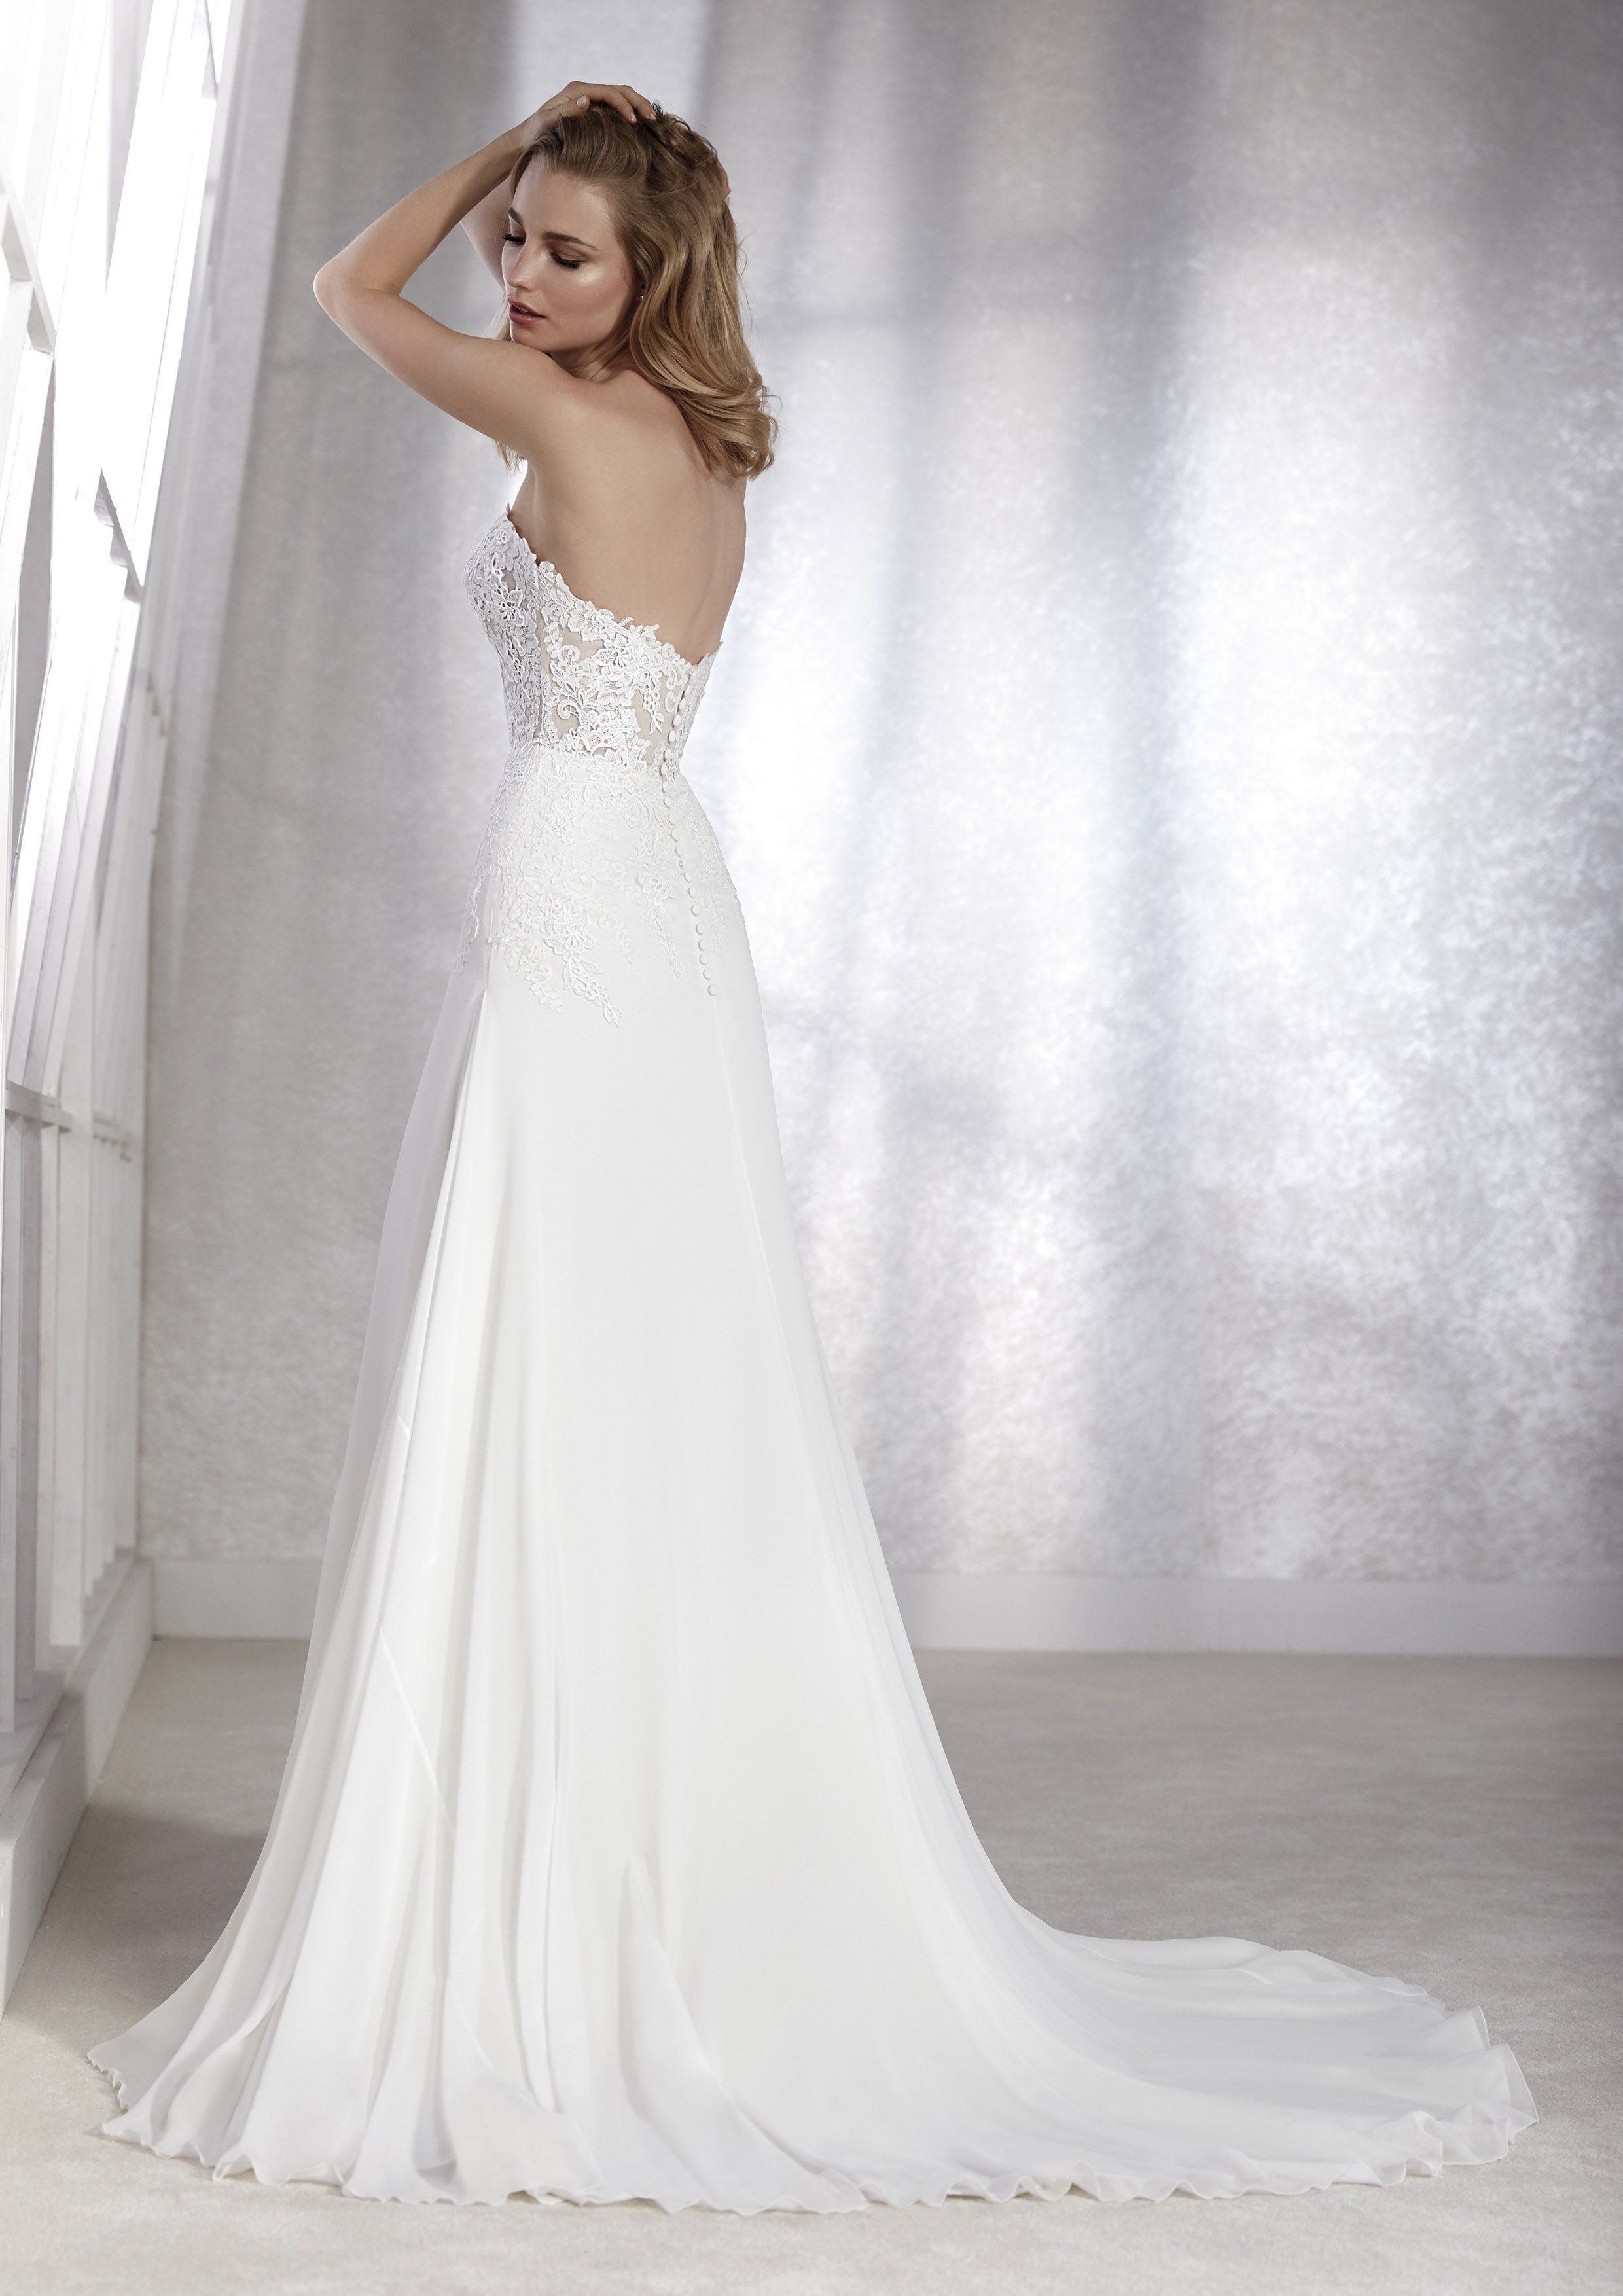 6d7b9d2d003 White One 2019 Collection - FILIPA. White One 2019 Collection - FILIPA  Vestidos De Novia ...